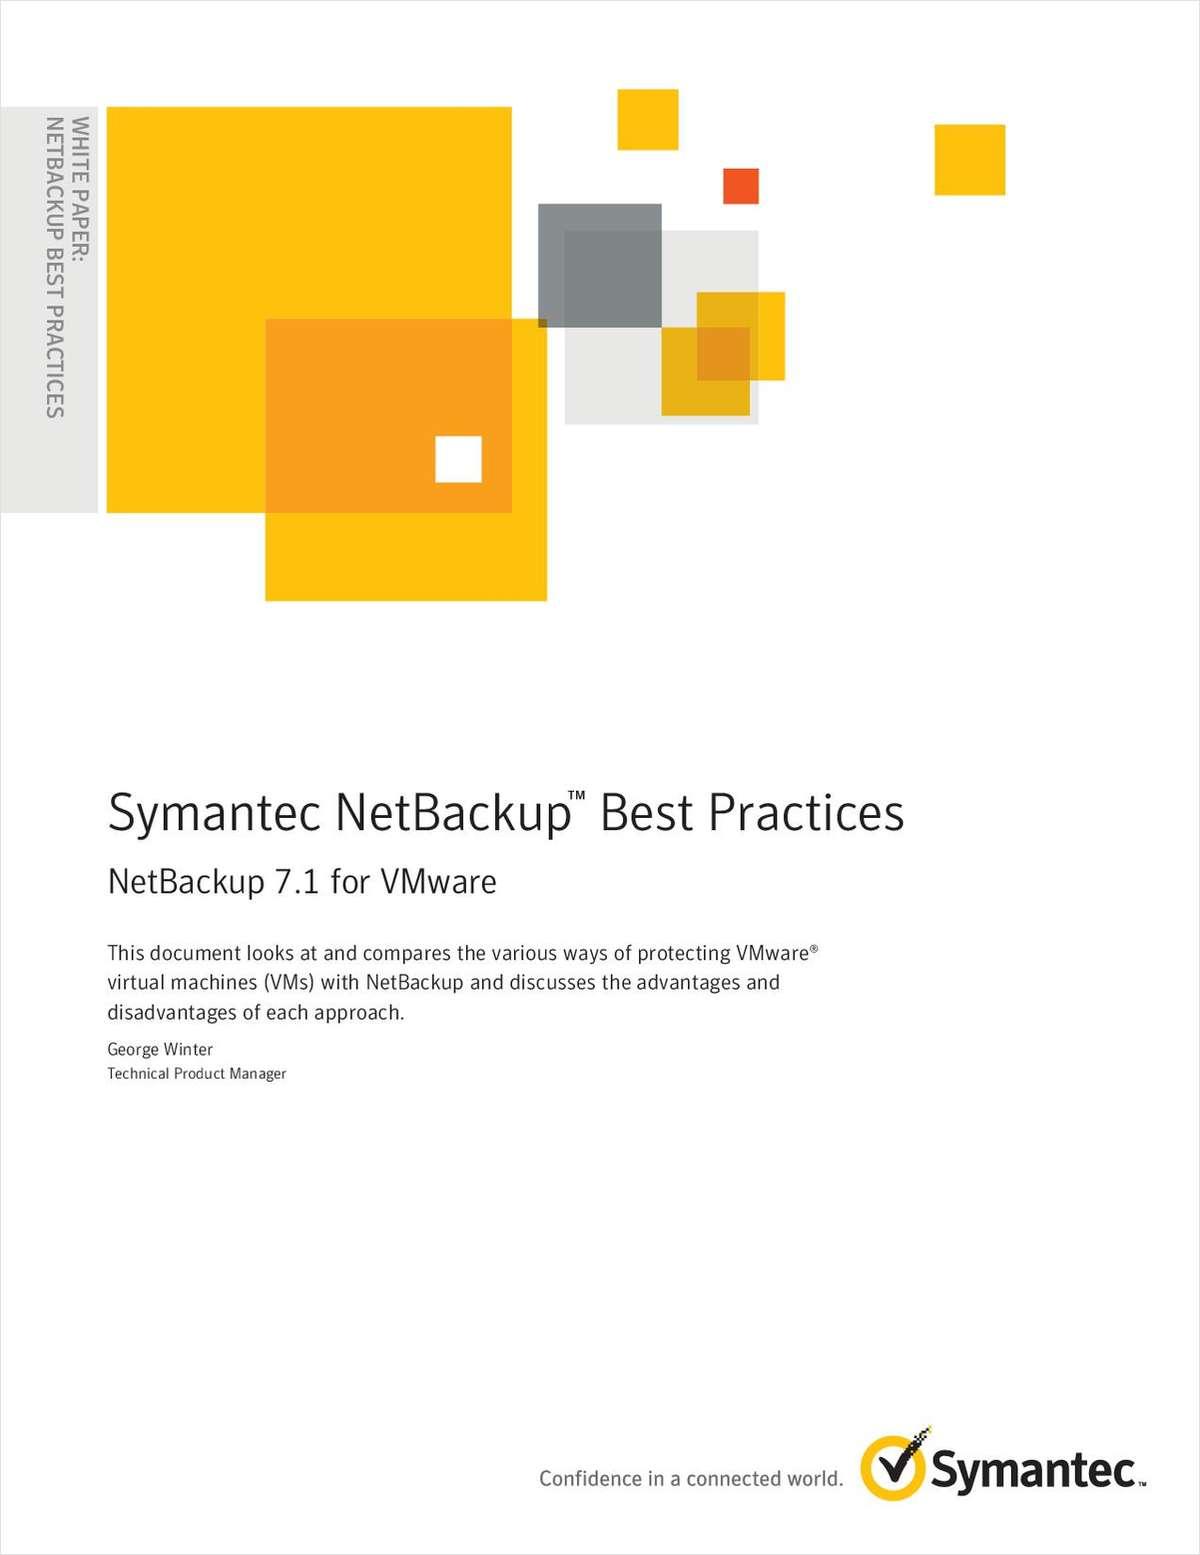 Symantec NetBackup™ Best Practices